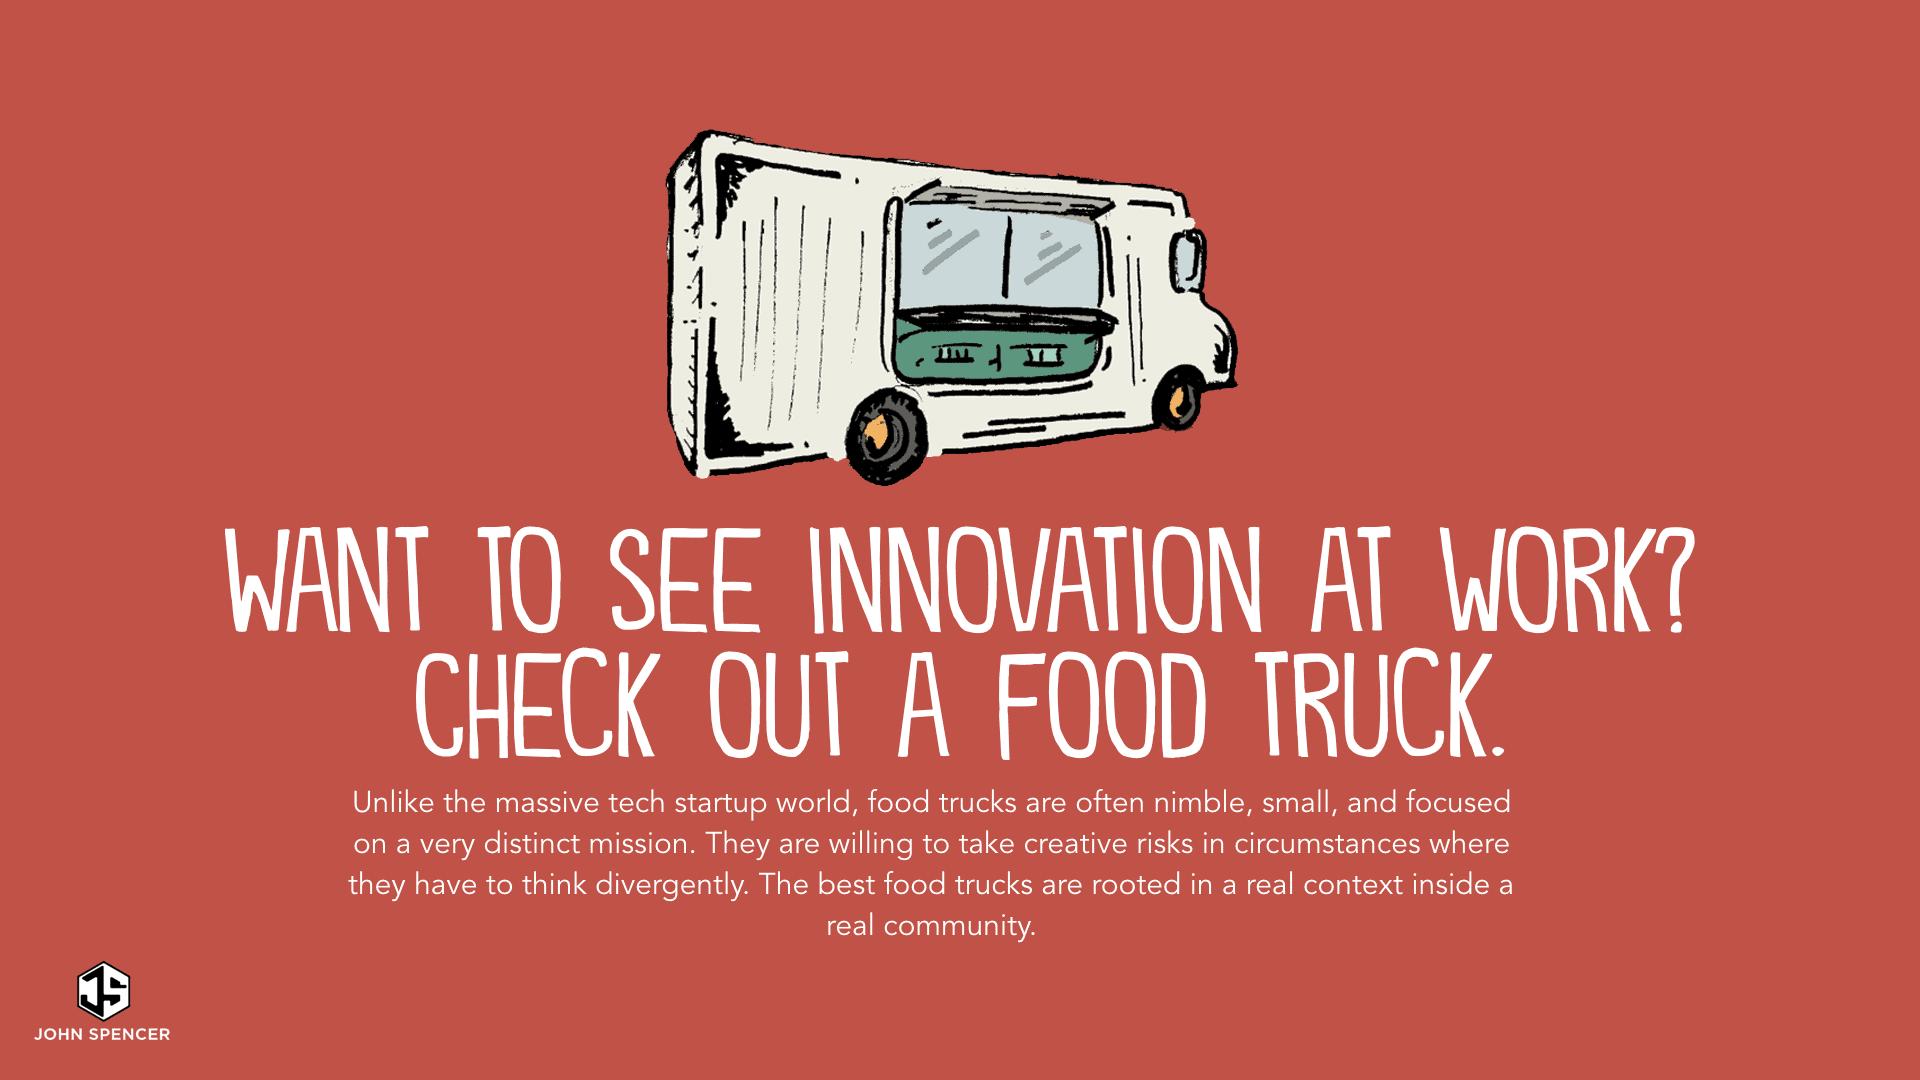 The Food Truck Mindset